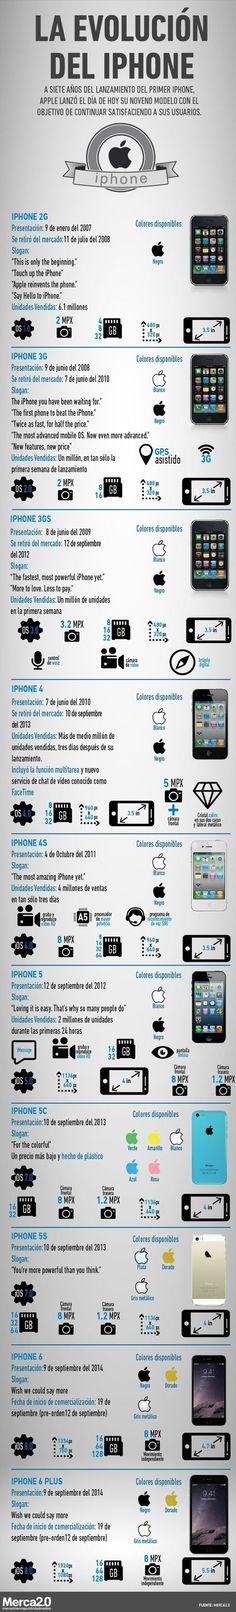 La evolución del iPhone #infografia